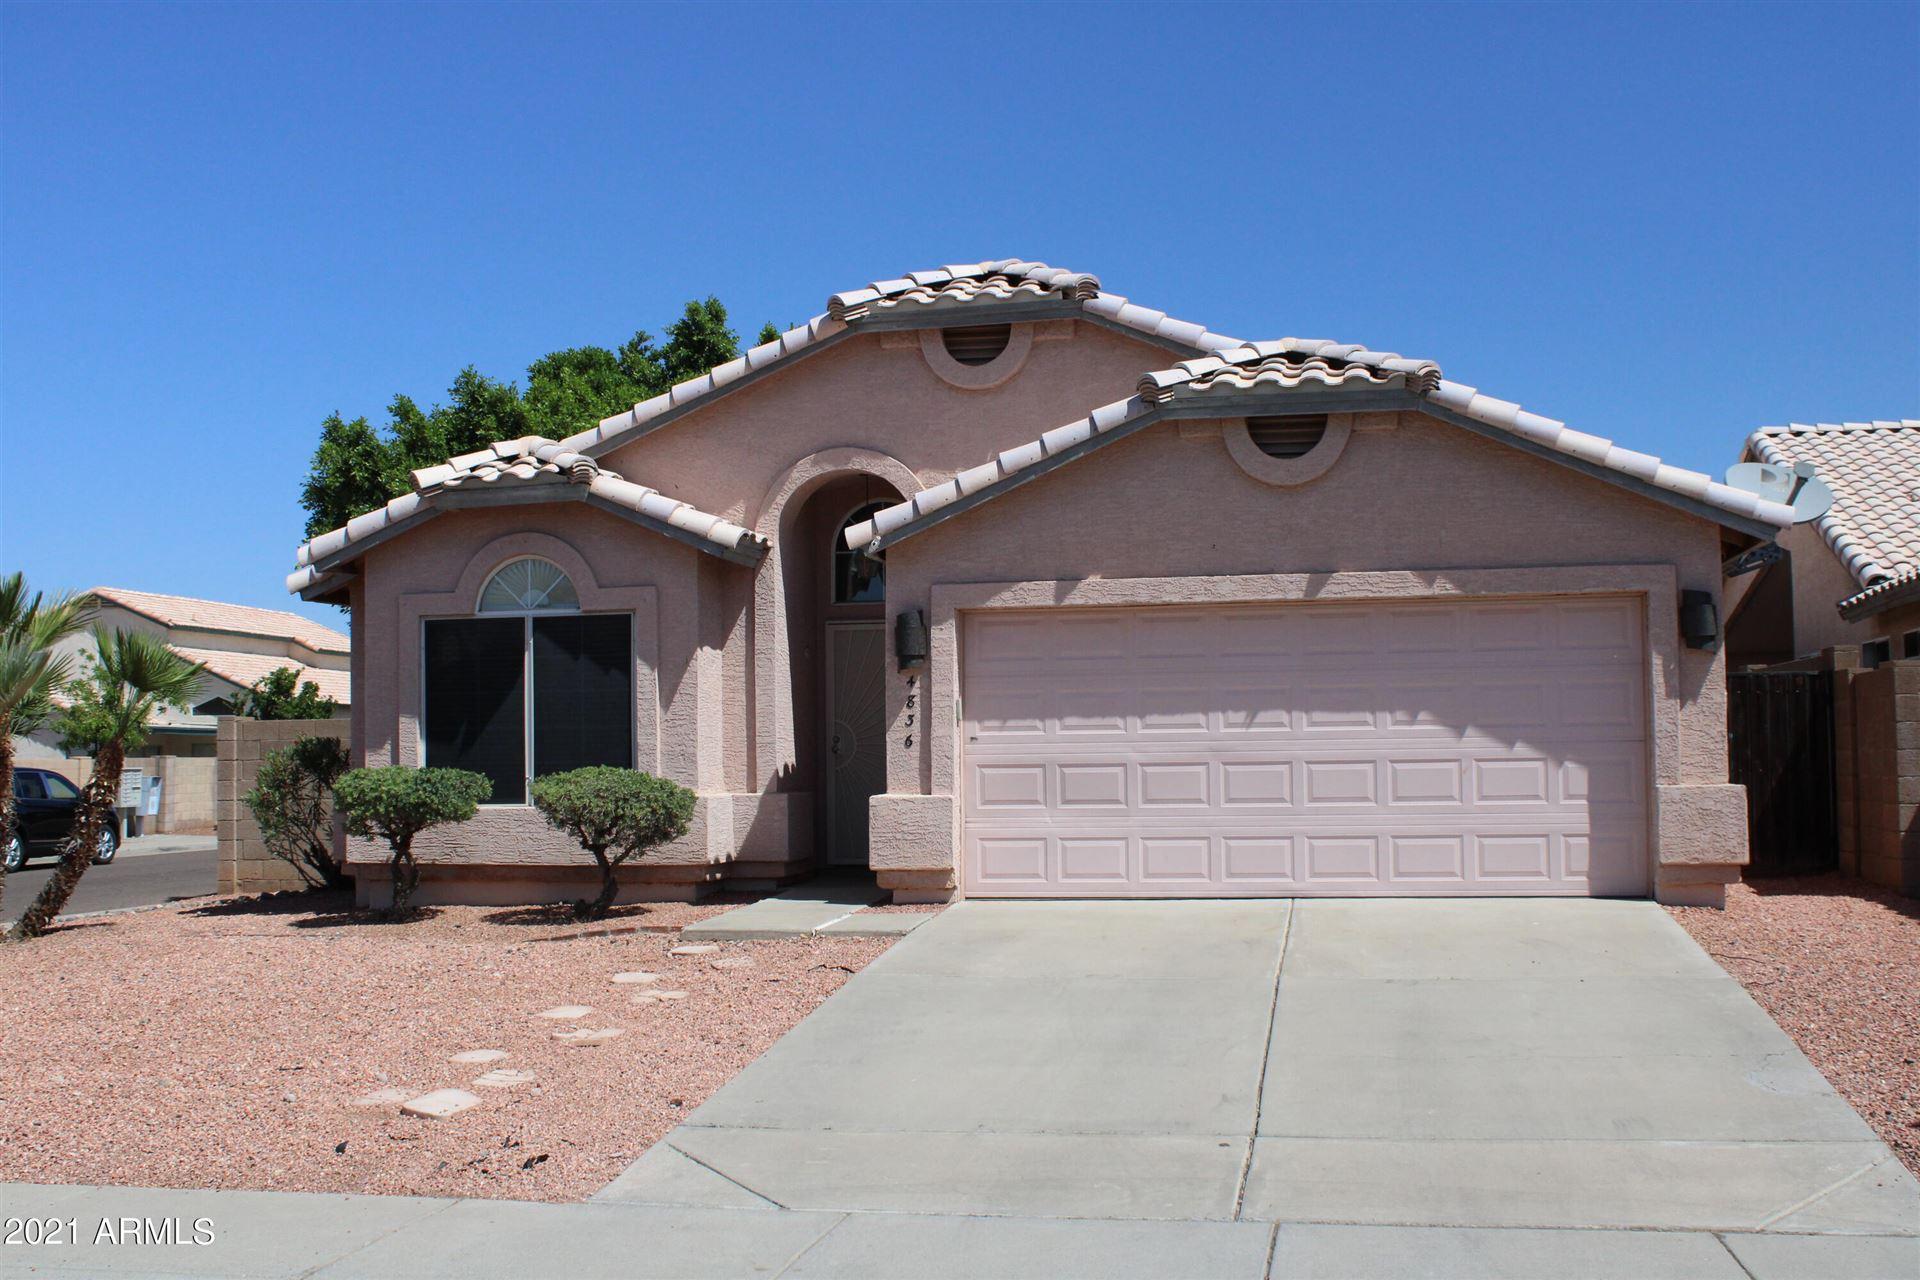 Photo of 4836 W TOPEKA Drive, Glendale, AZ 85308 (MLS # 6232486)